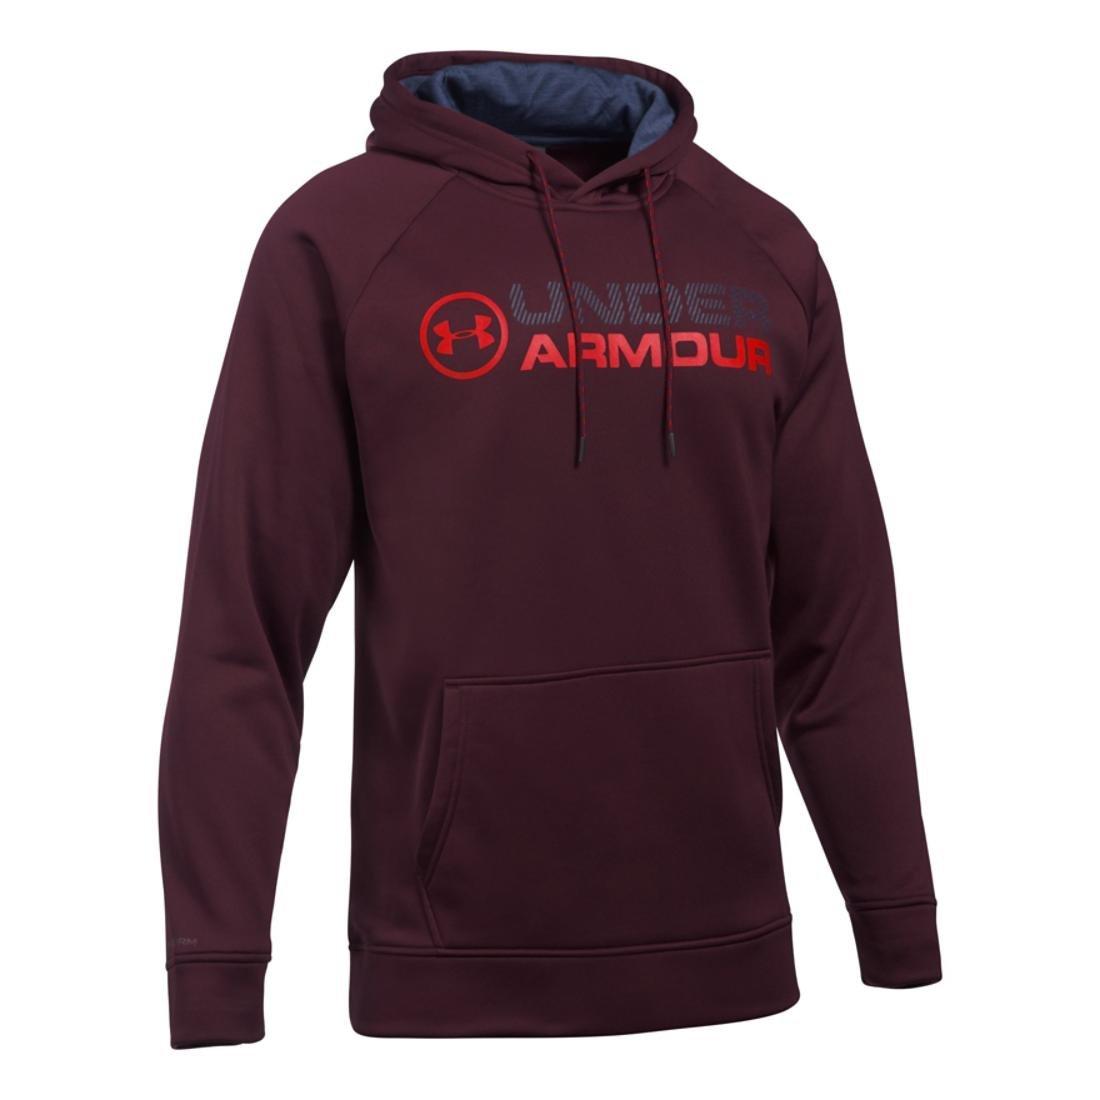 Under ArmourメンズStormフリースWordmark Hoodie 4XL-R Raisin Red B075DFSS73